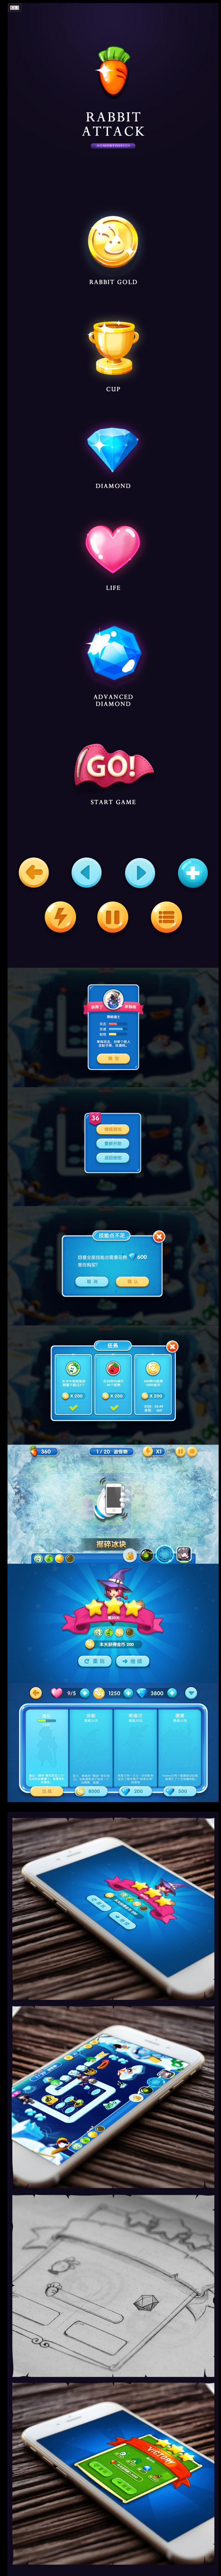 Game Ui Design 进击的萝卜...